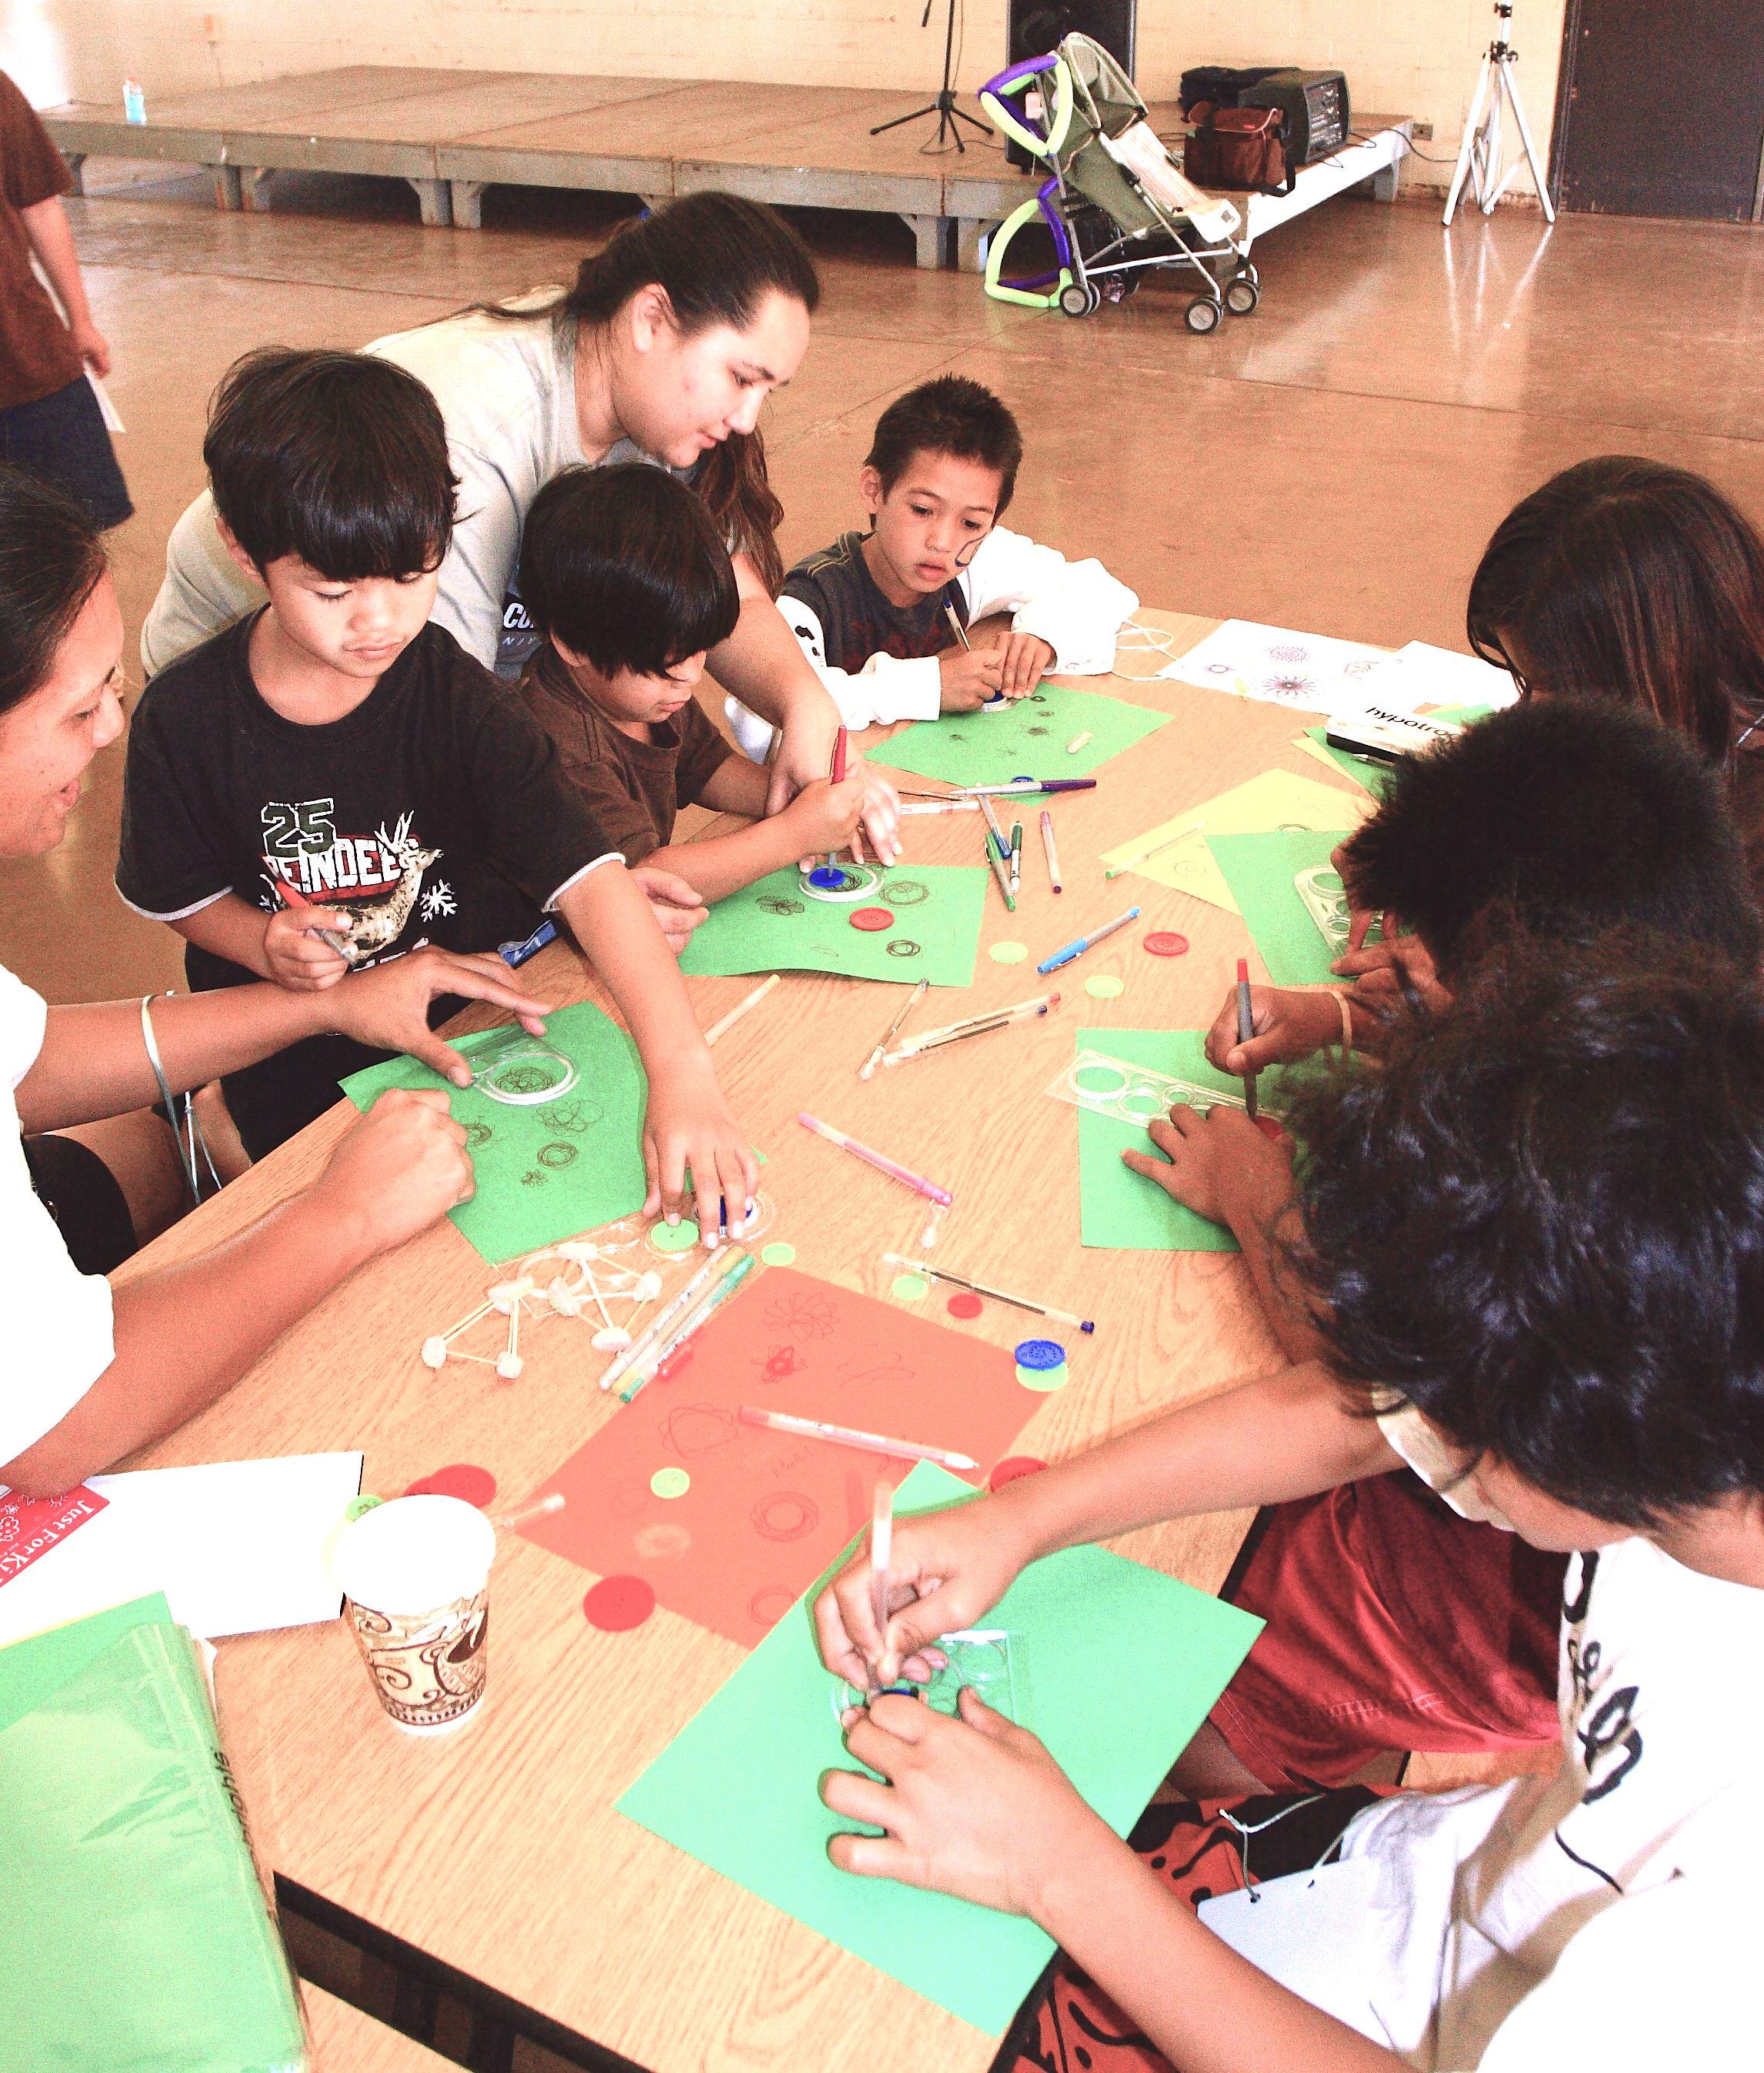 Math Day returns to inspire keiki on STEM